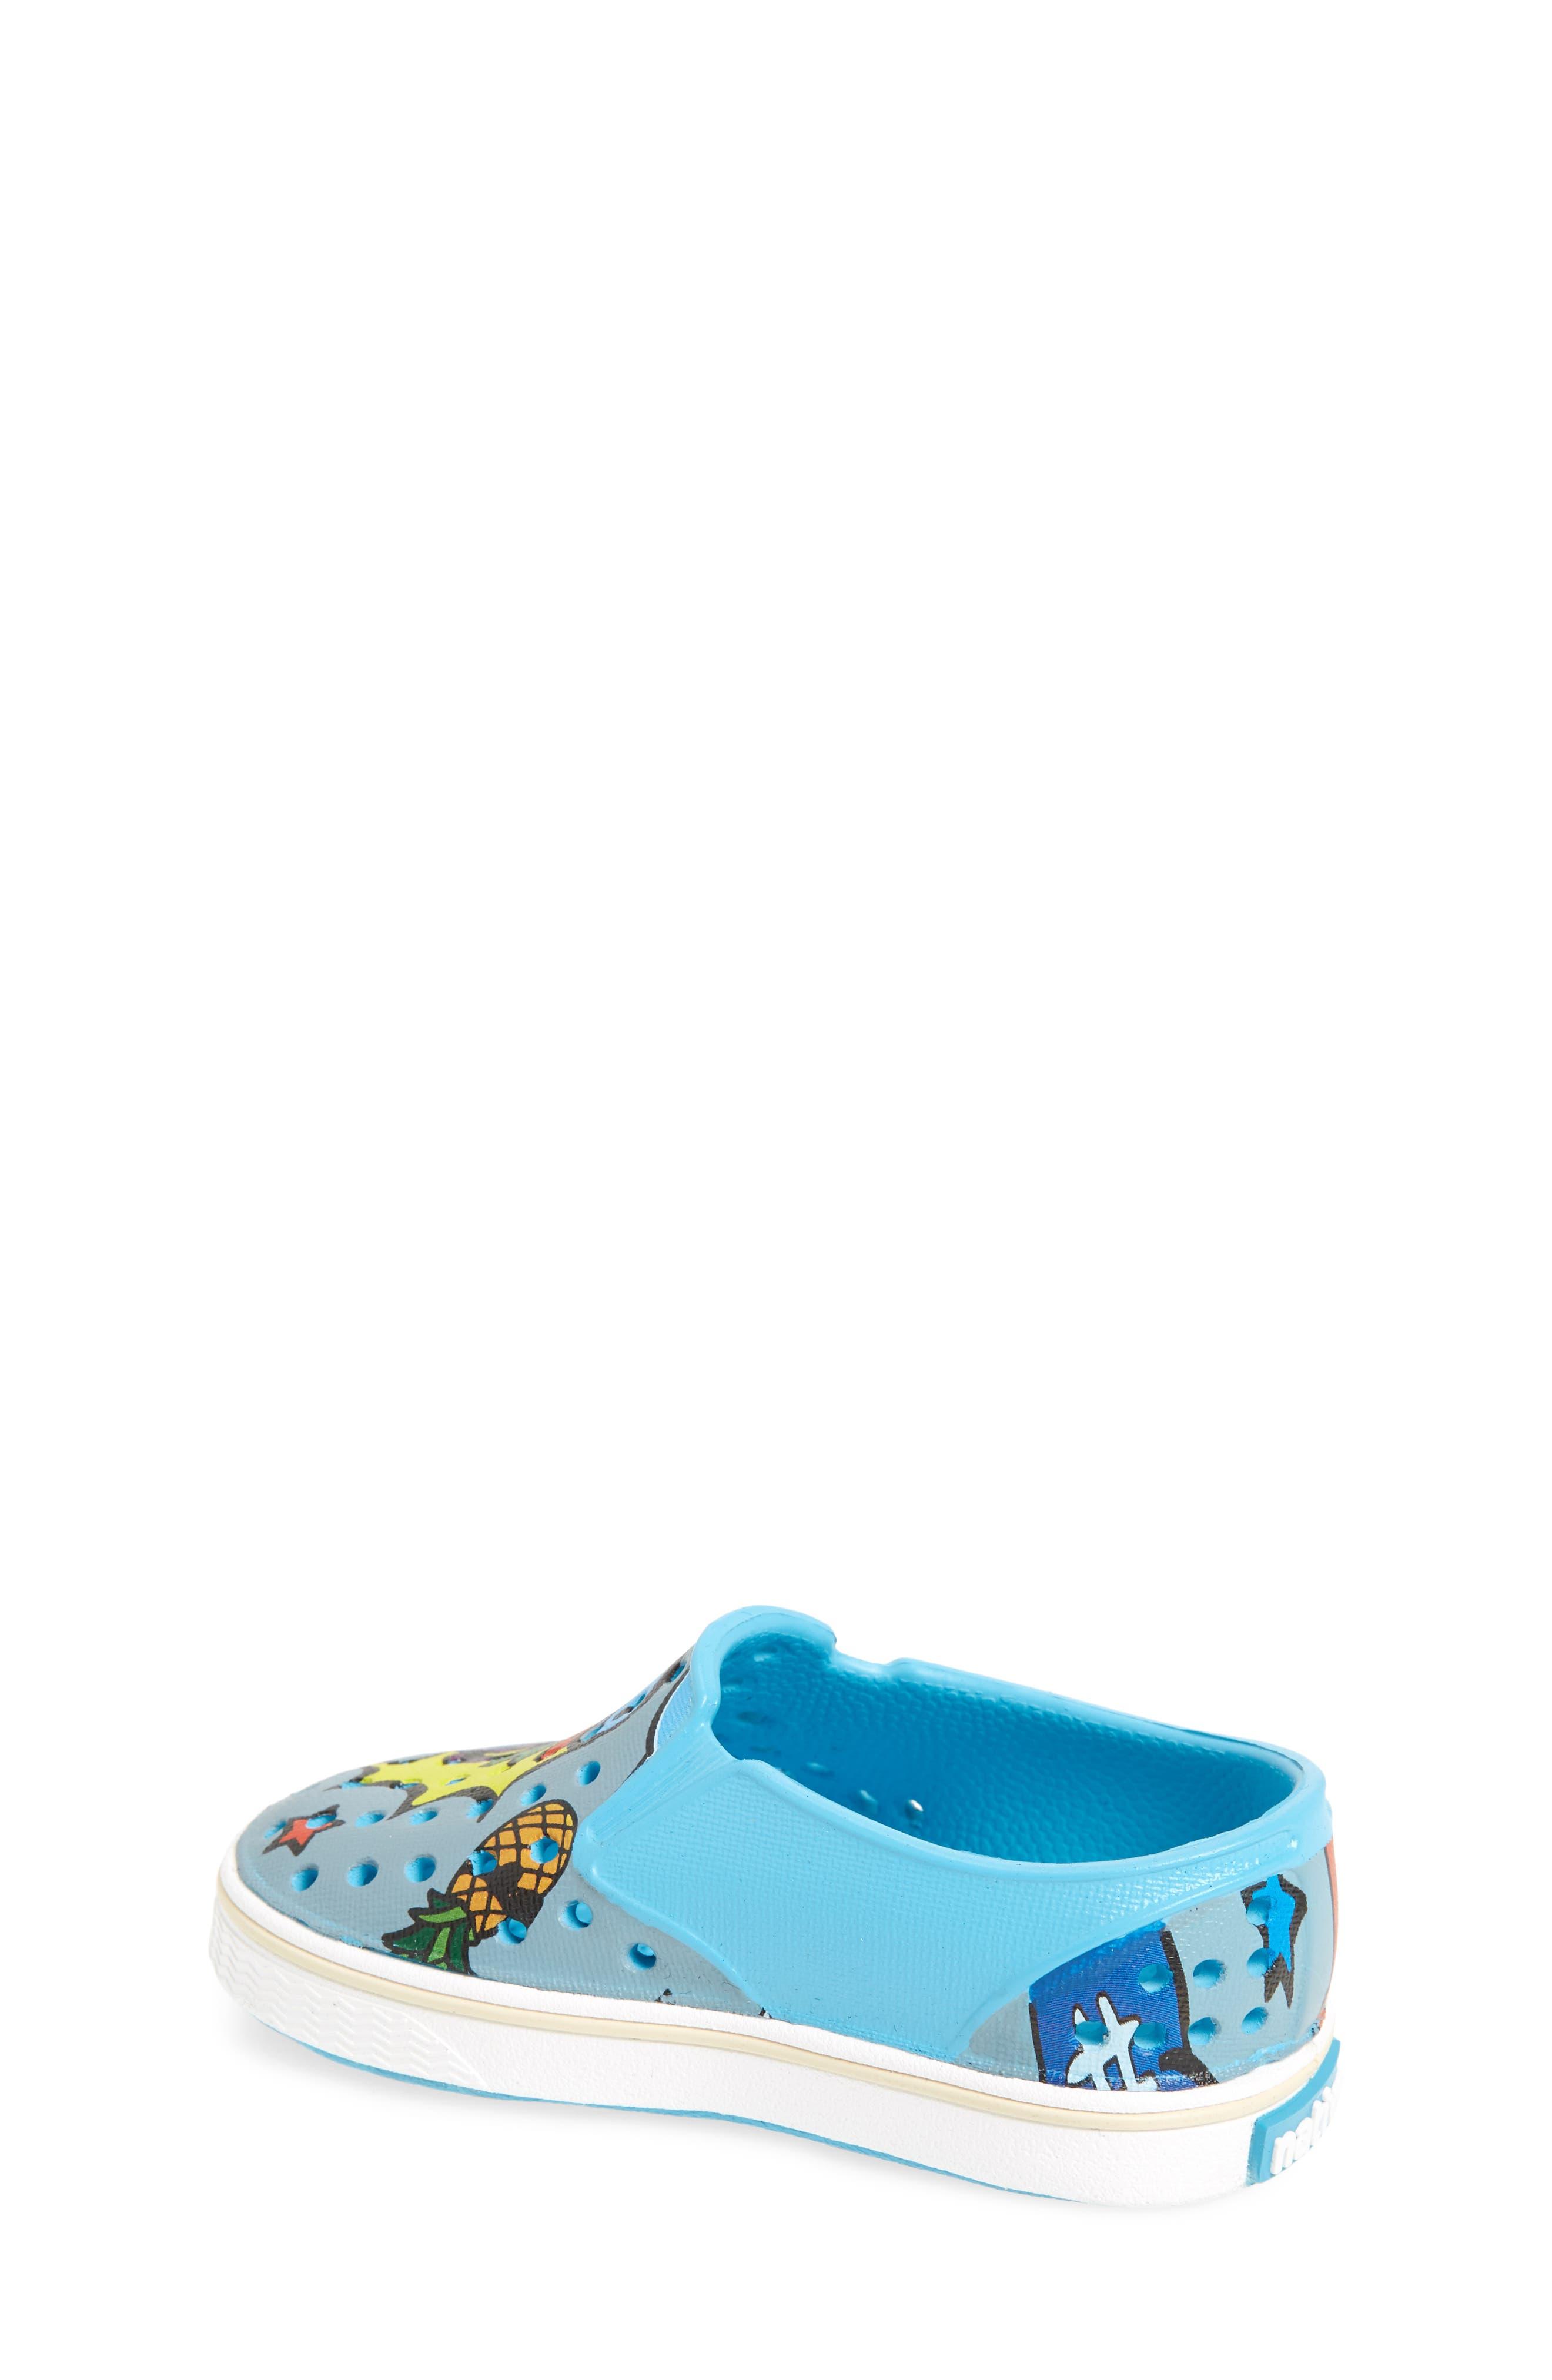 Alternate Image 2  - Native Shoes Miles Print Slip-On Sneaker (Baby, Walker, Toddler, Little Kid & Big Kid)